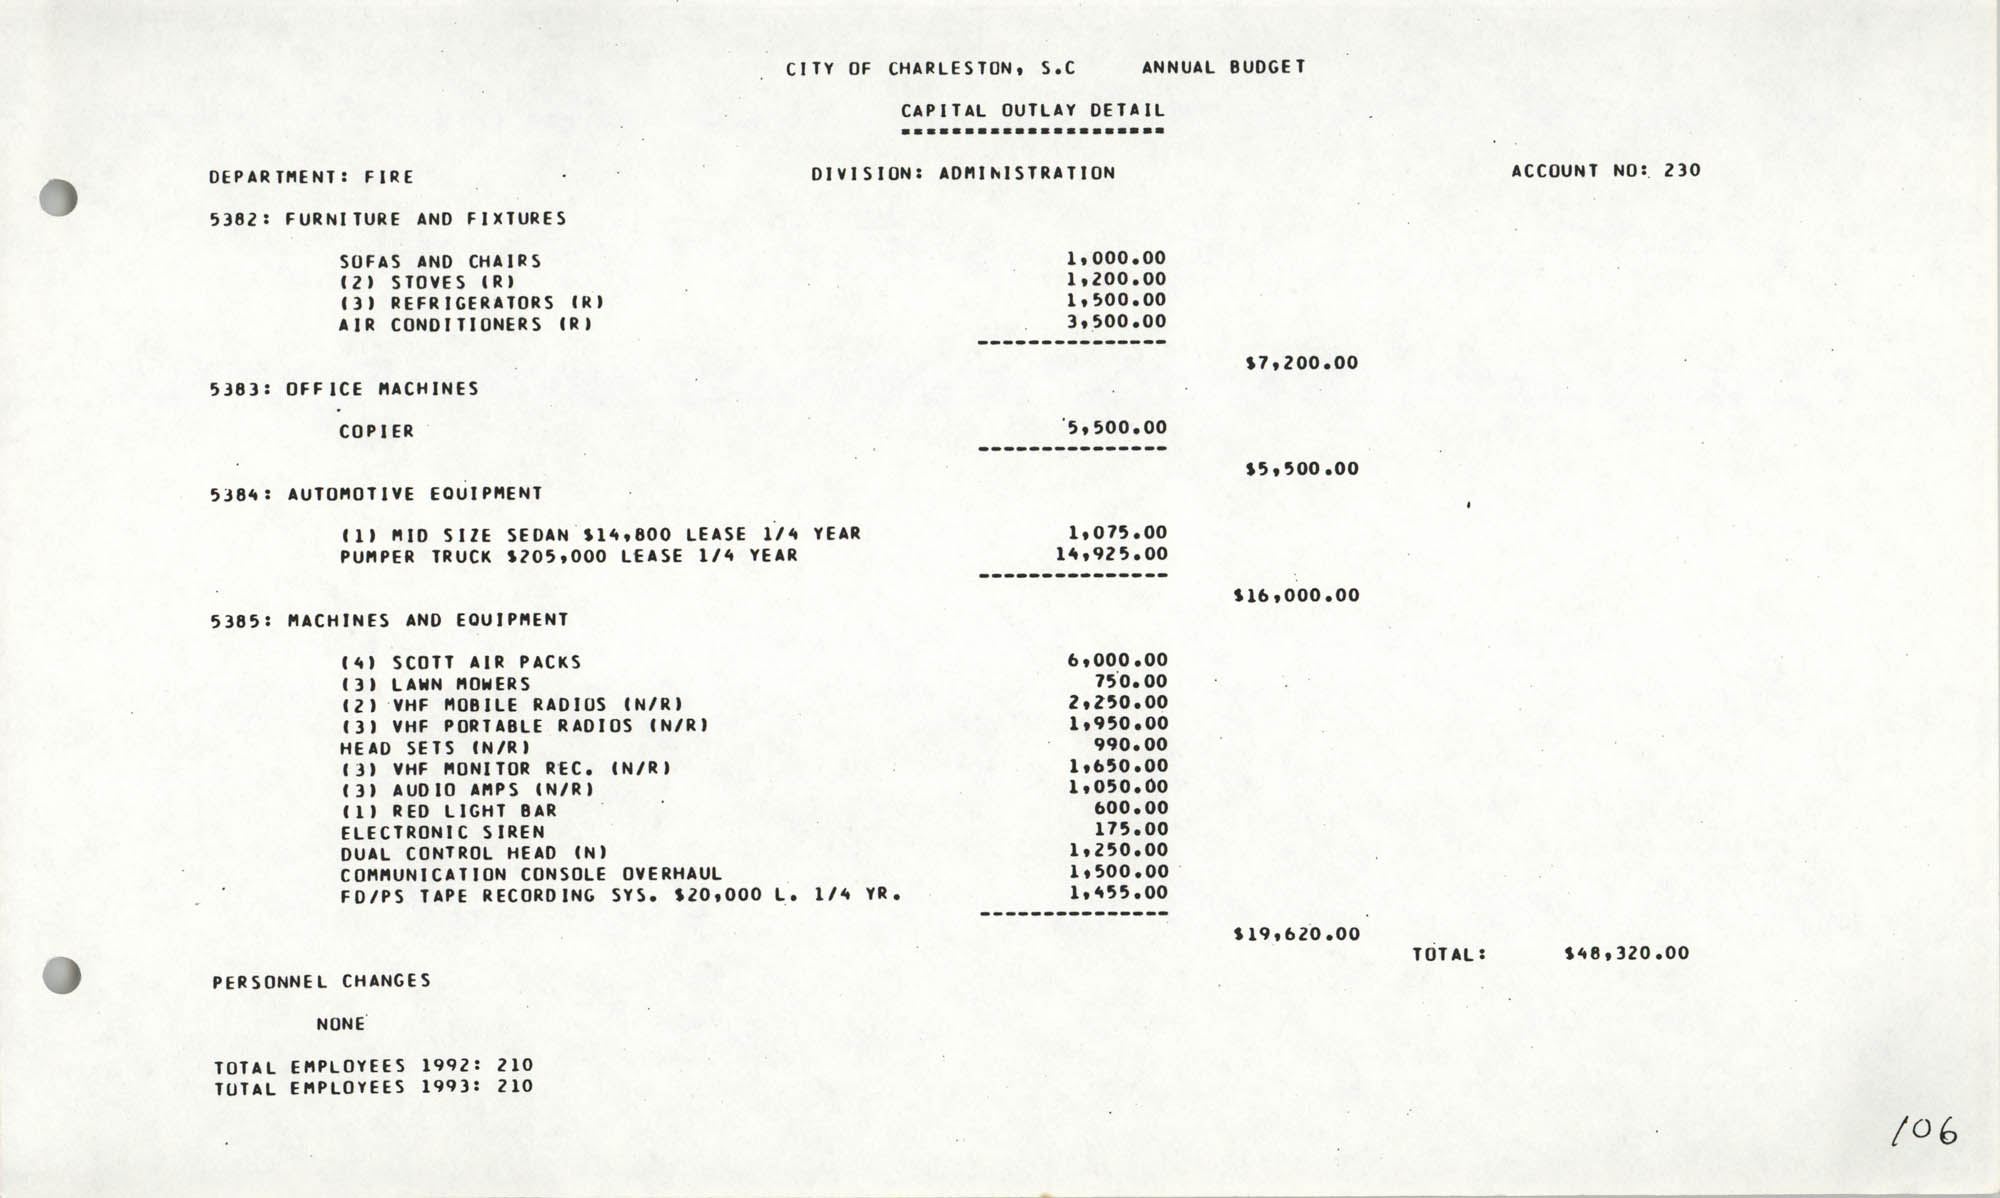 The City Council of Charleston, South Carolina, 1993 Budget, Page 106